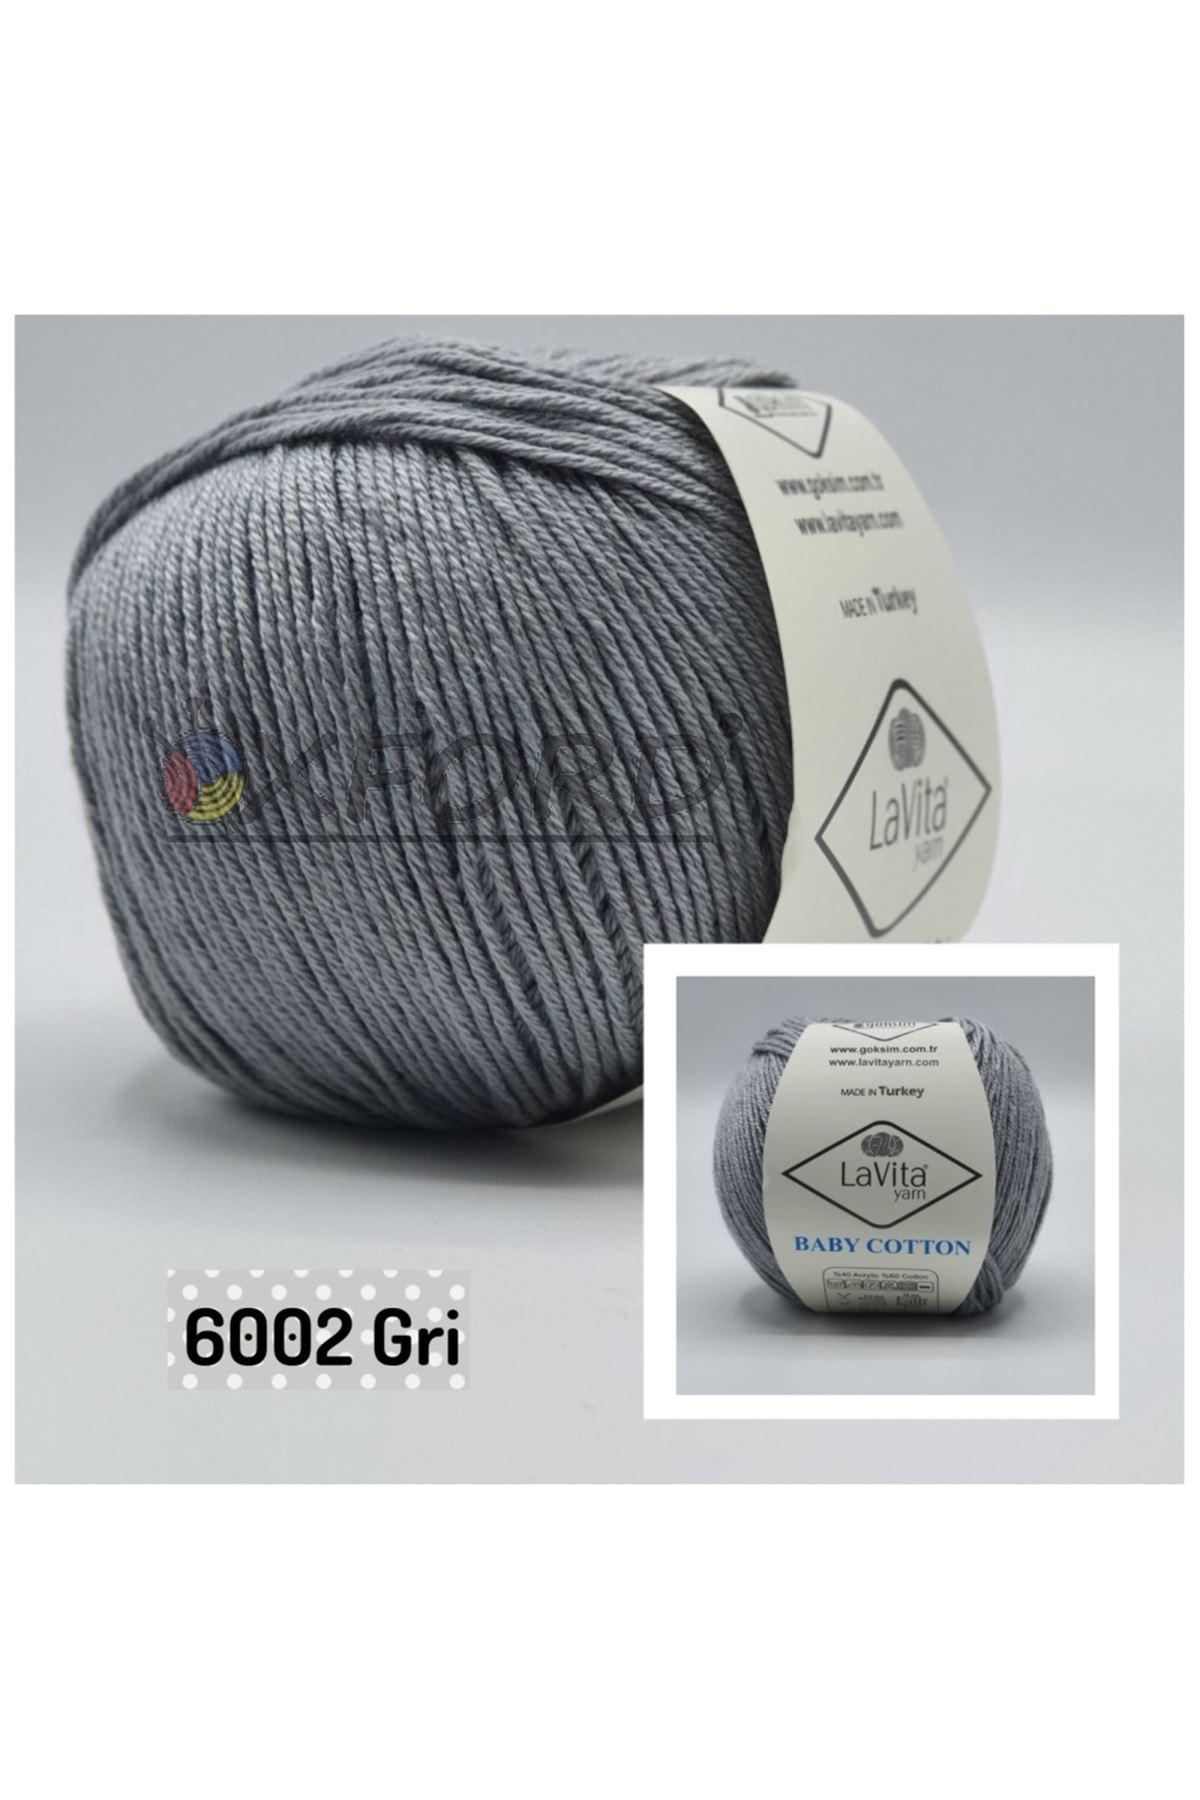 Lavita Baby Cotton 6002 Gri